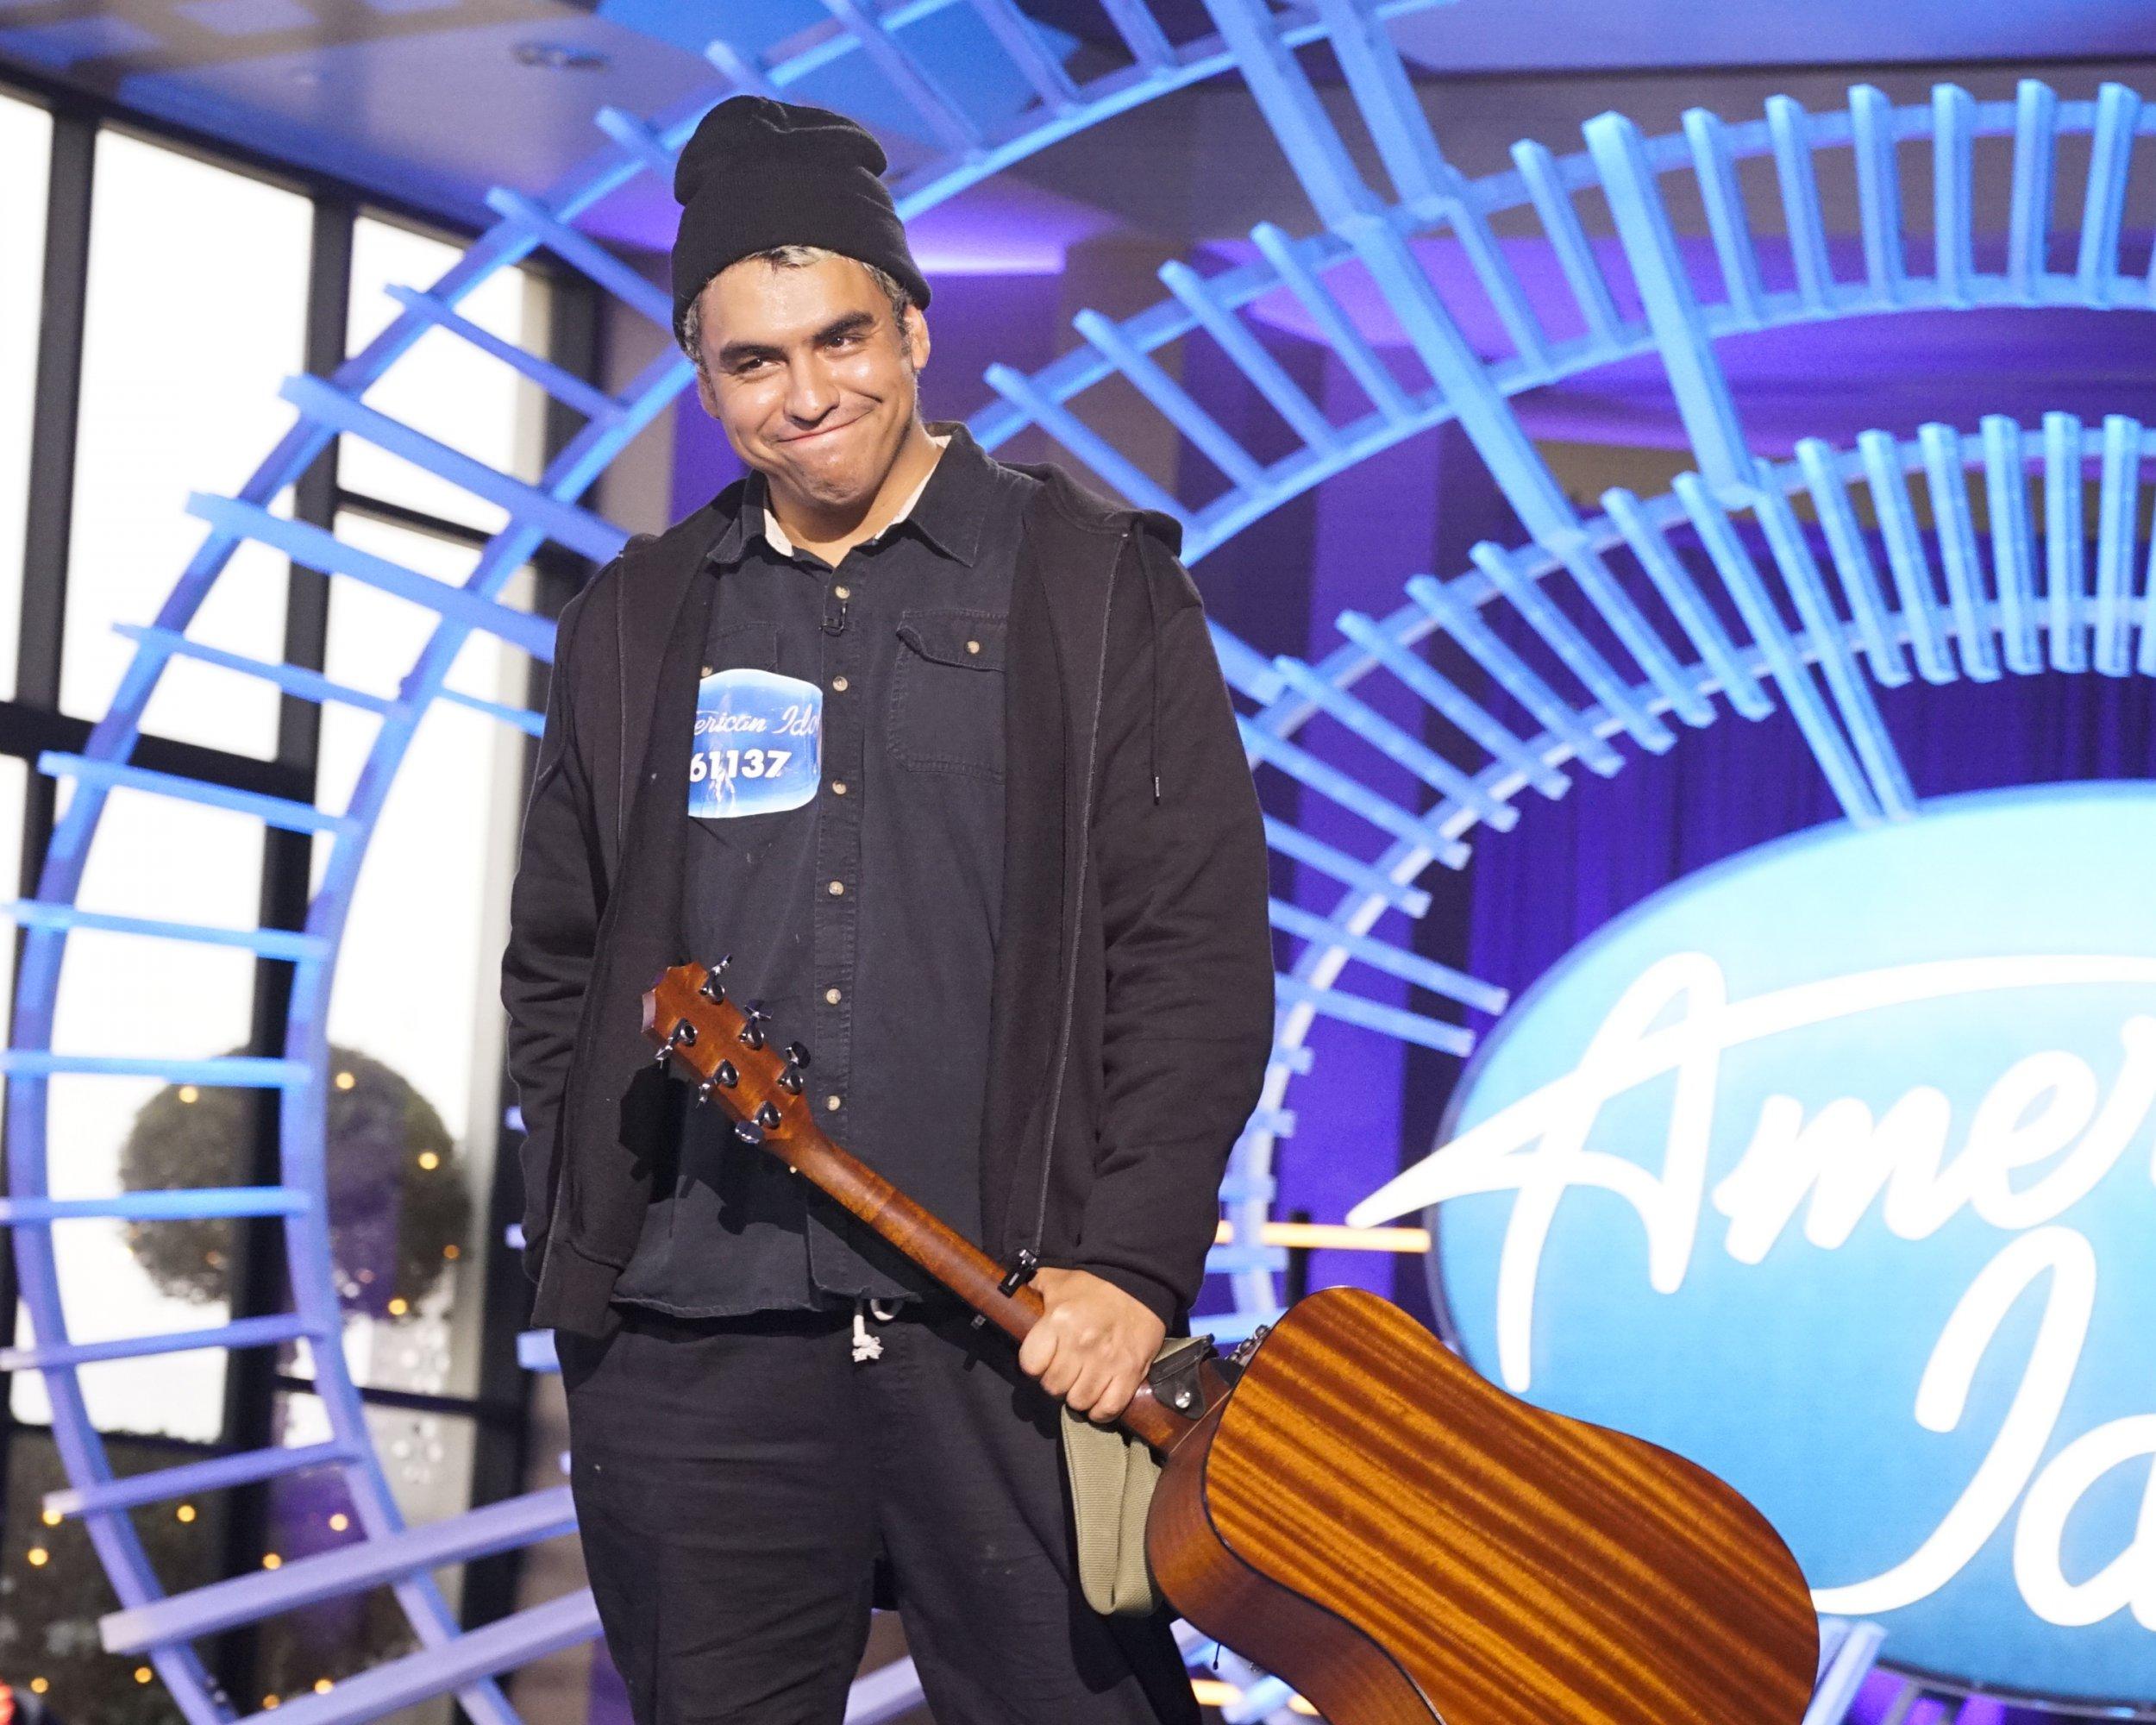 ALEJANDRO ARANDA Episode 2 of 'American Idol'